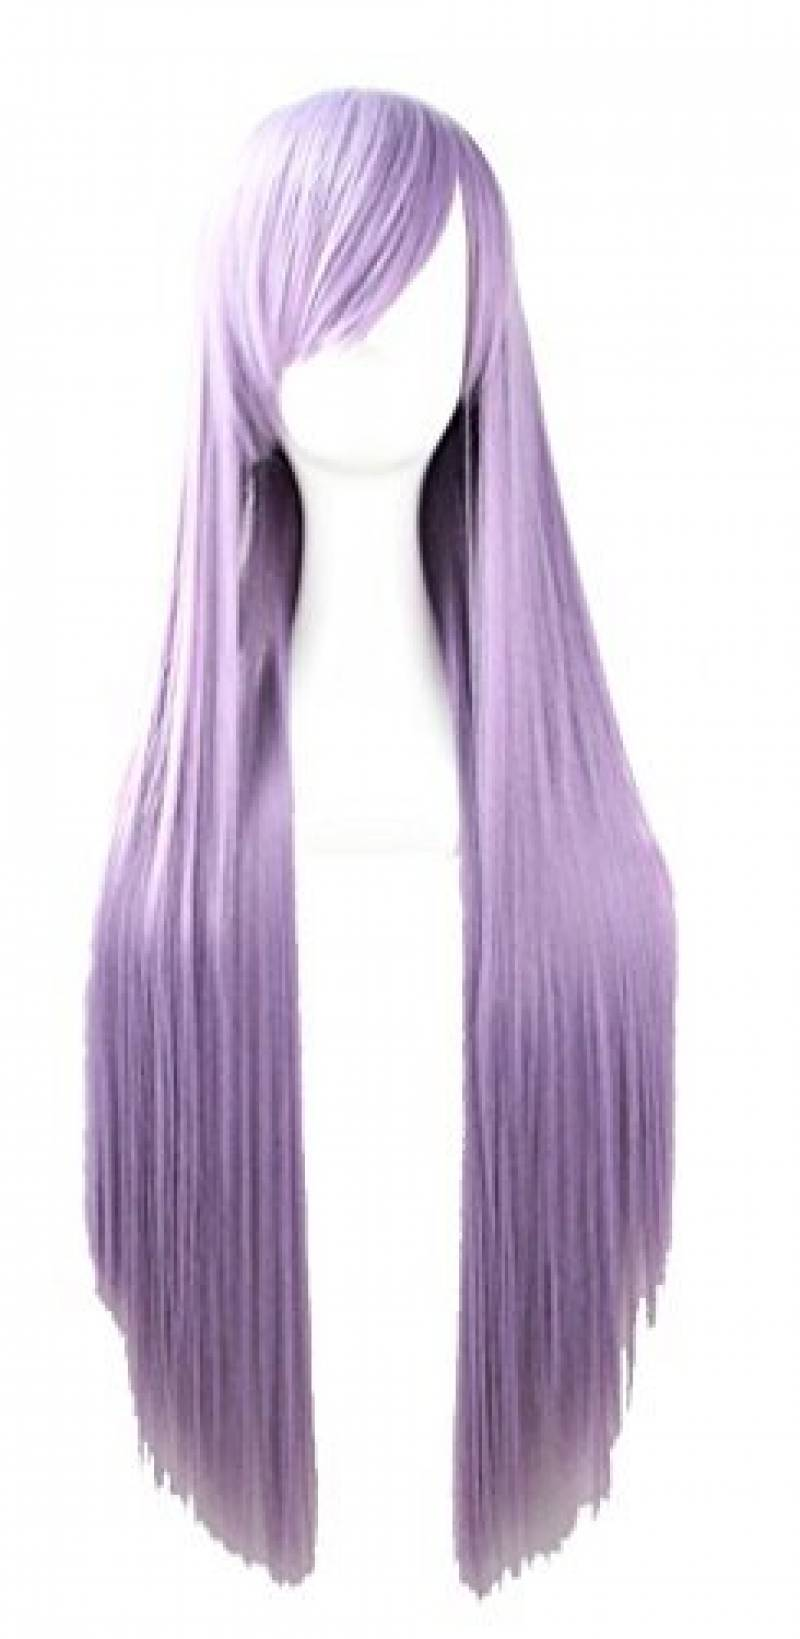 Quibine 80cm Longue Ligne Droite Perruque Cosplay Multicolore Perruques Smoky Violette de la marque Quibine TOP 8 image 0 produit